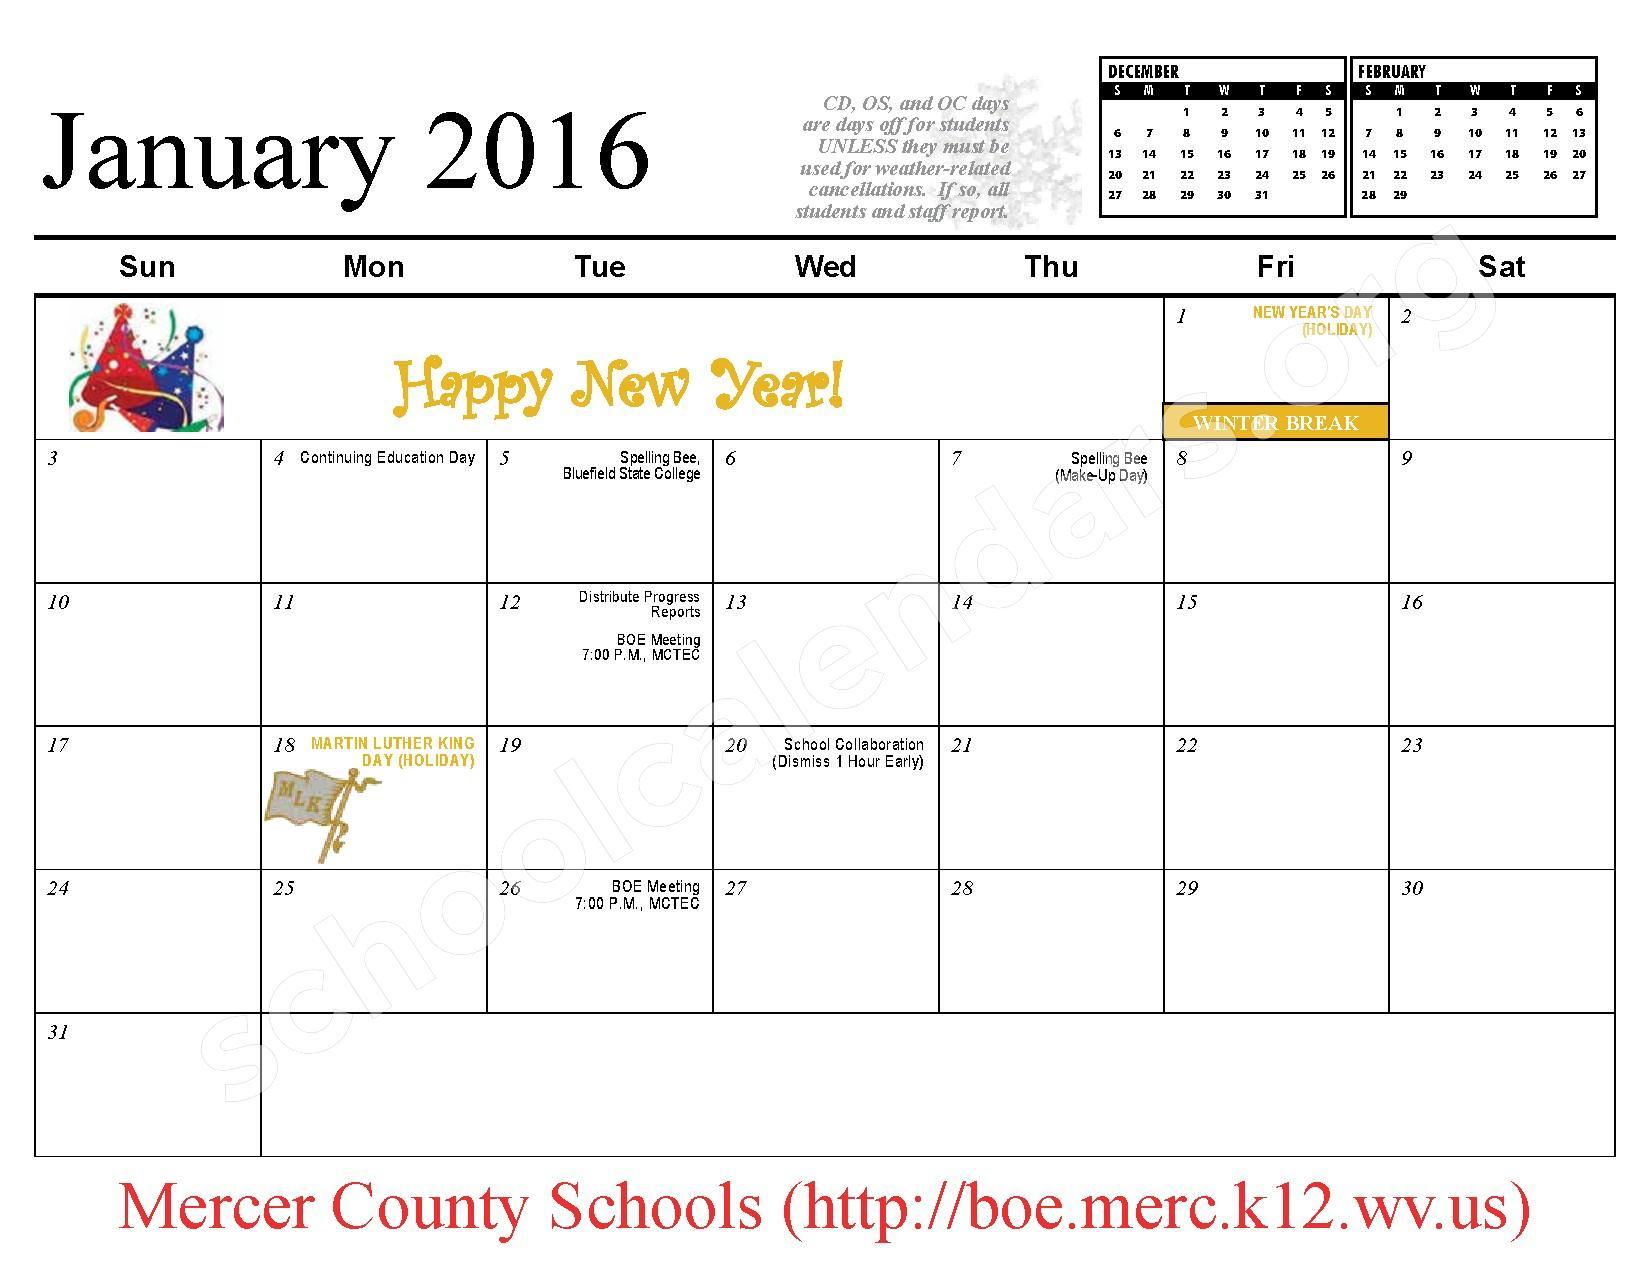 2015 - 2016 School Calendar – Mercer County Schools – page 8